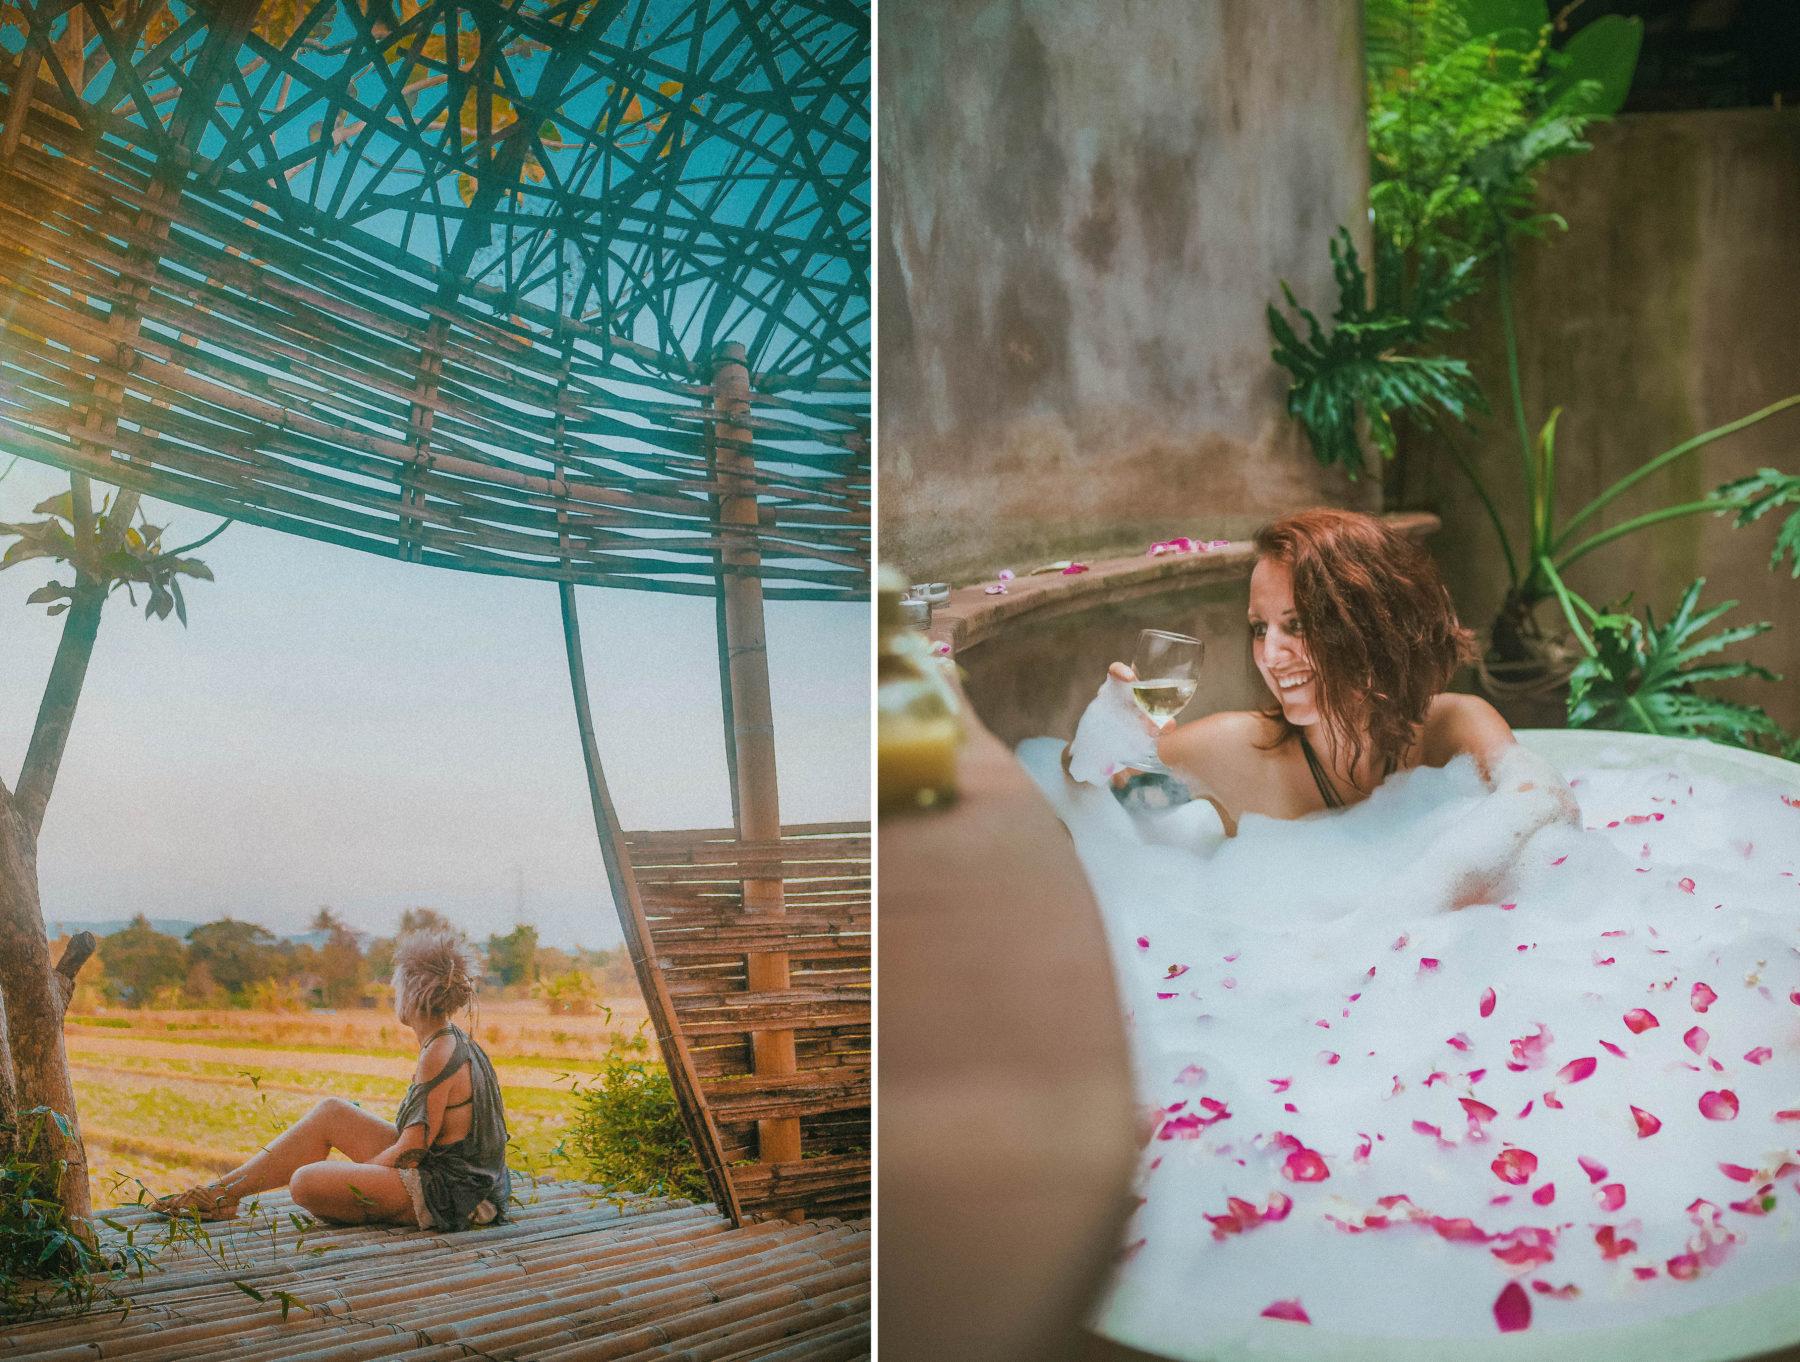 breakfast in private villa yogyakarta homestay sewon village eco lodge eco friendly vegan breakfast beautiful interior view bath outside bubble bath relax wine